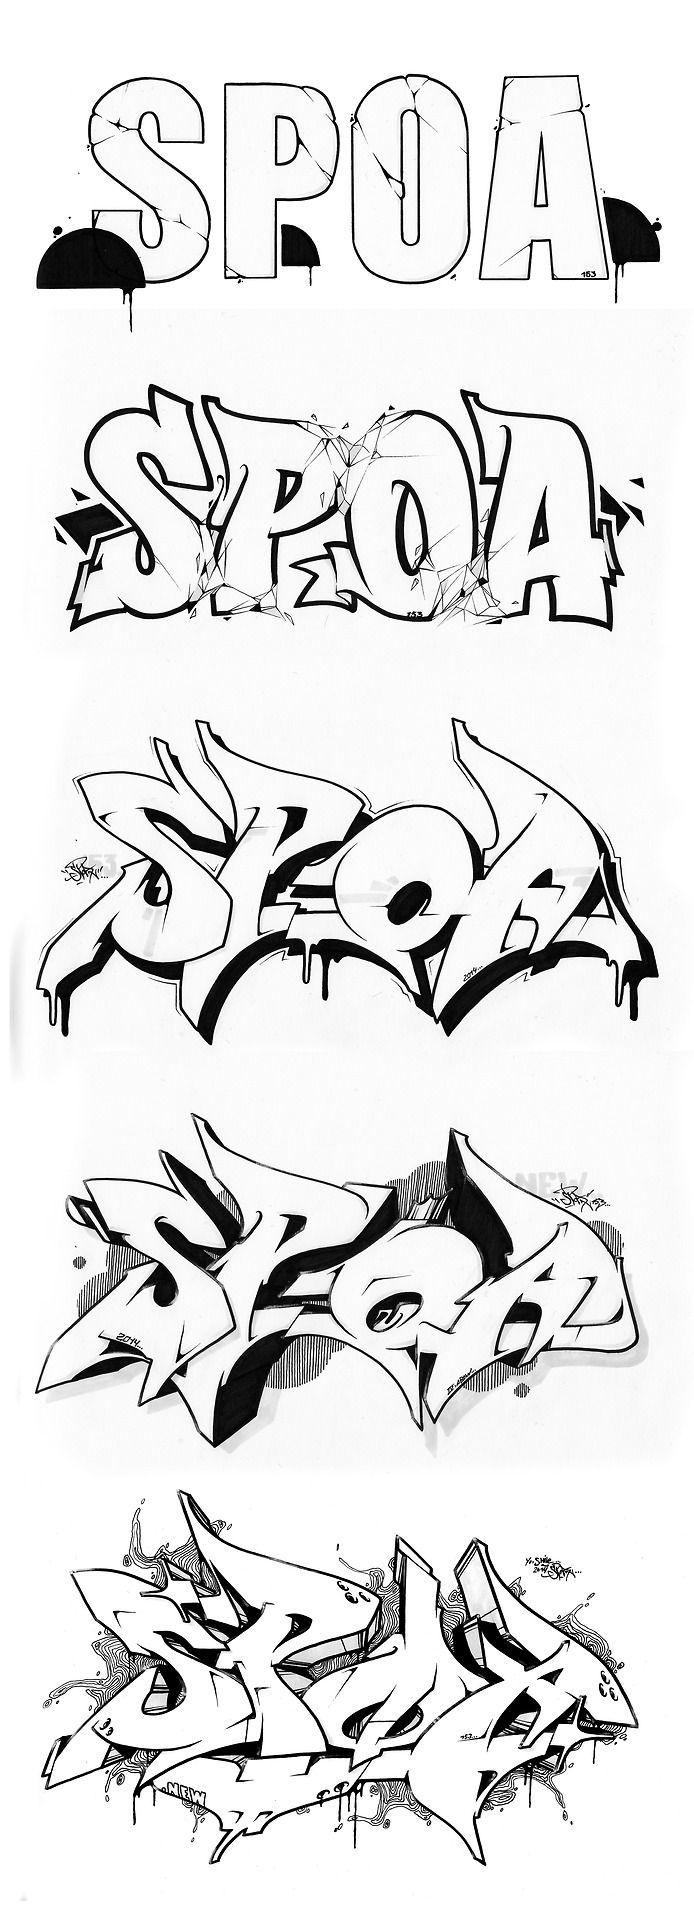 Graff-City : Photo